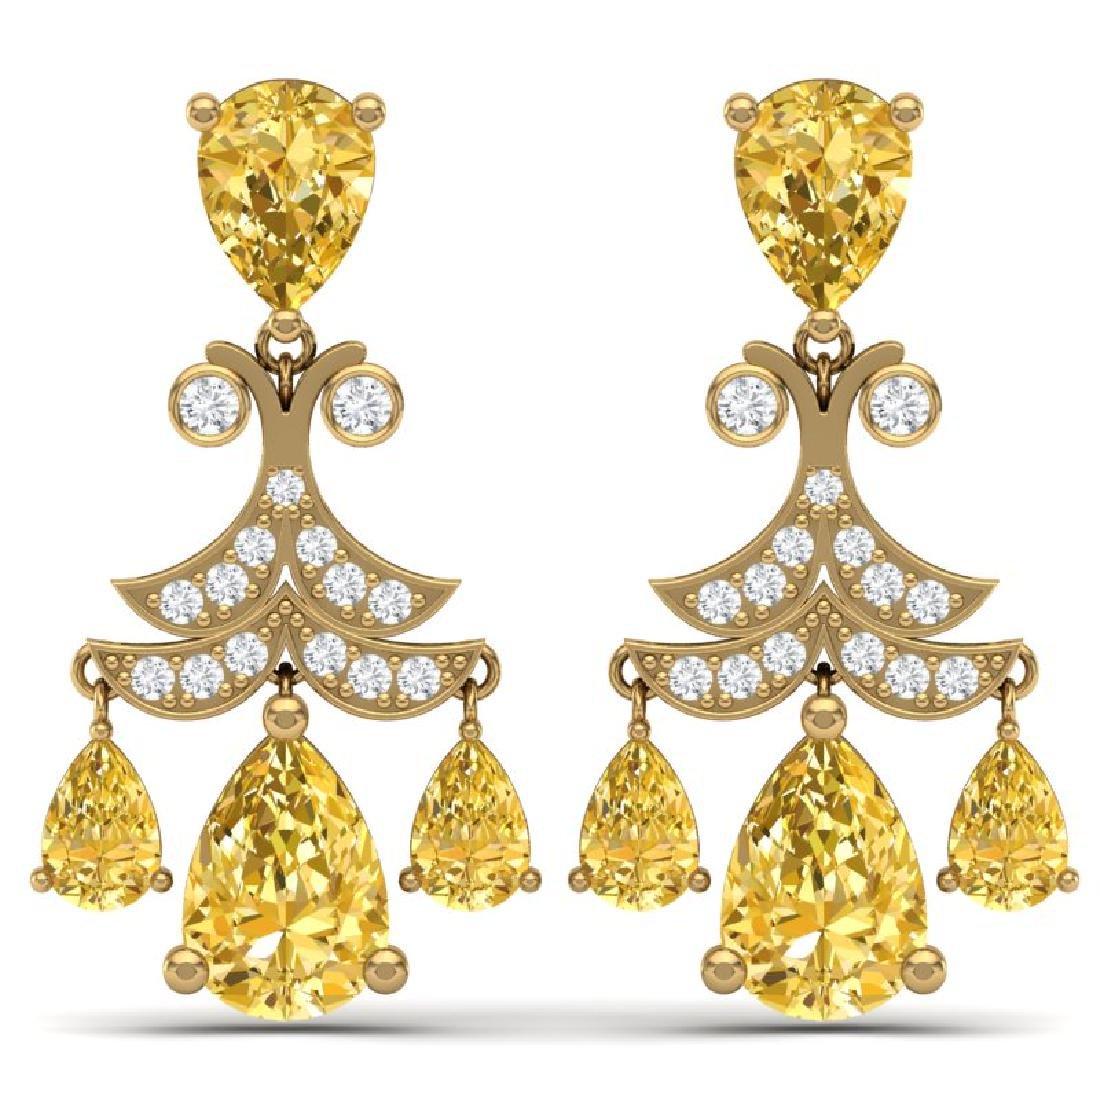 10.41 CTW Royalty Canary Citrine & VS Diamond Earrings